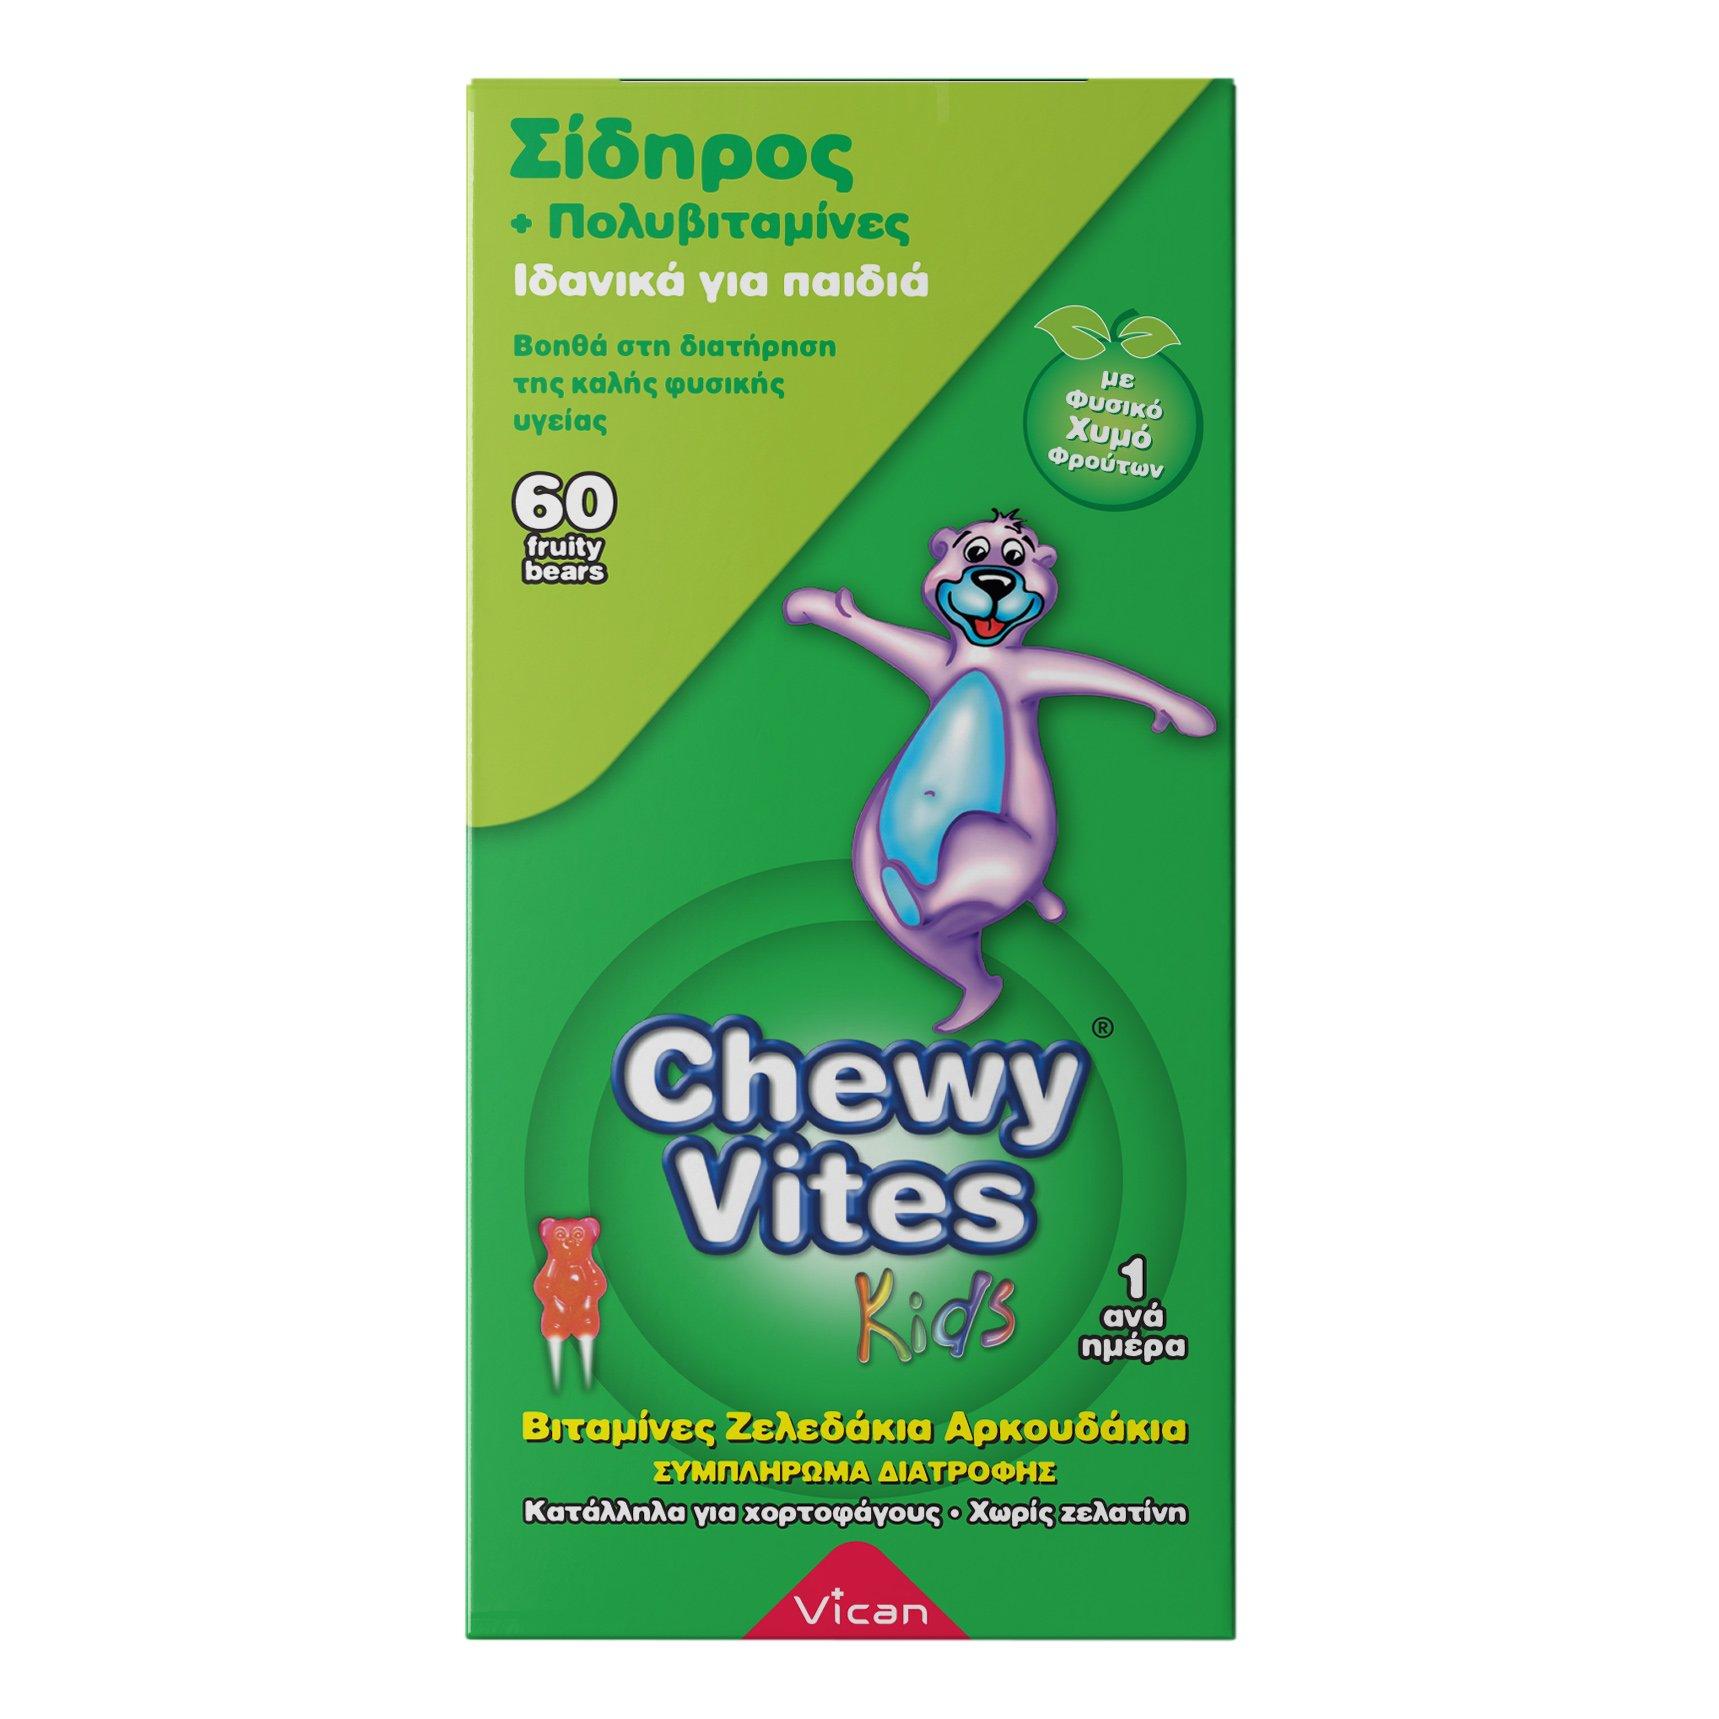 Chewy Vites Kids Iron Σίδηρος - Πολυβιταμίνες Ζελεδάκια για Παιδιά, Βοηθά στη Διατήρηση της Καλής Φυσικής Υγείας 60Bears Chews